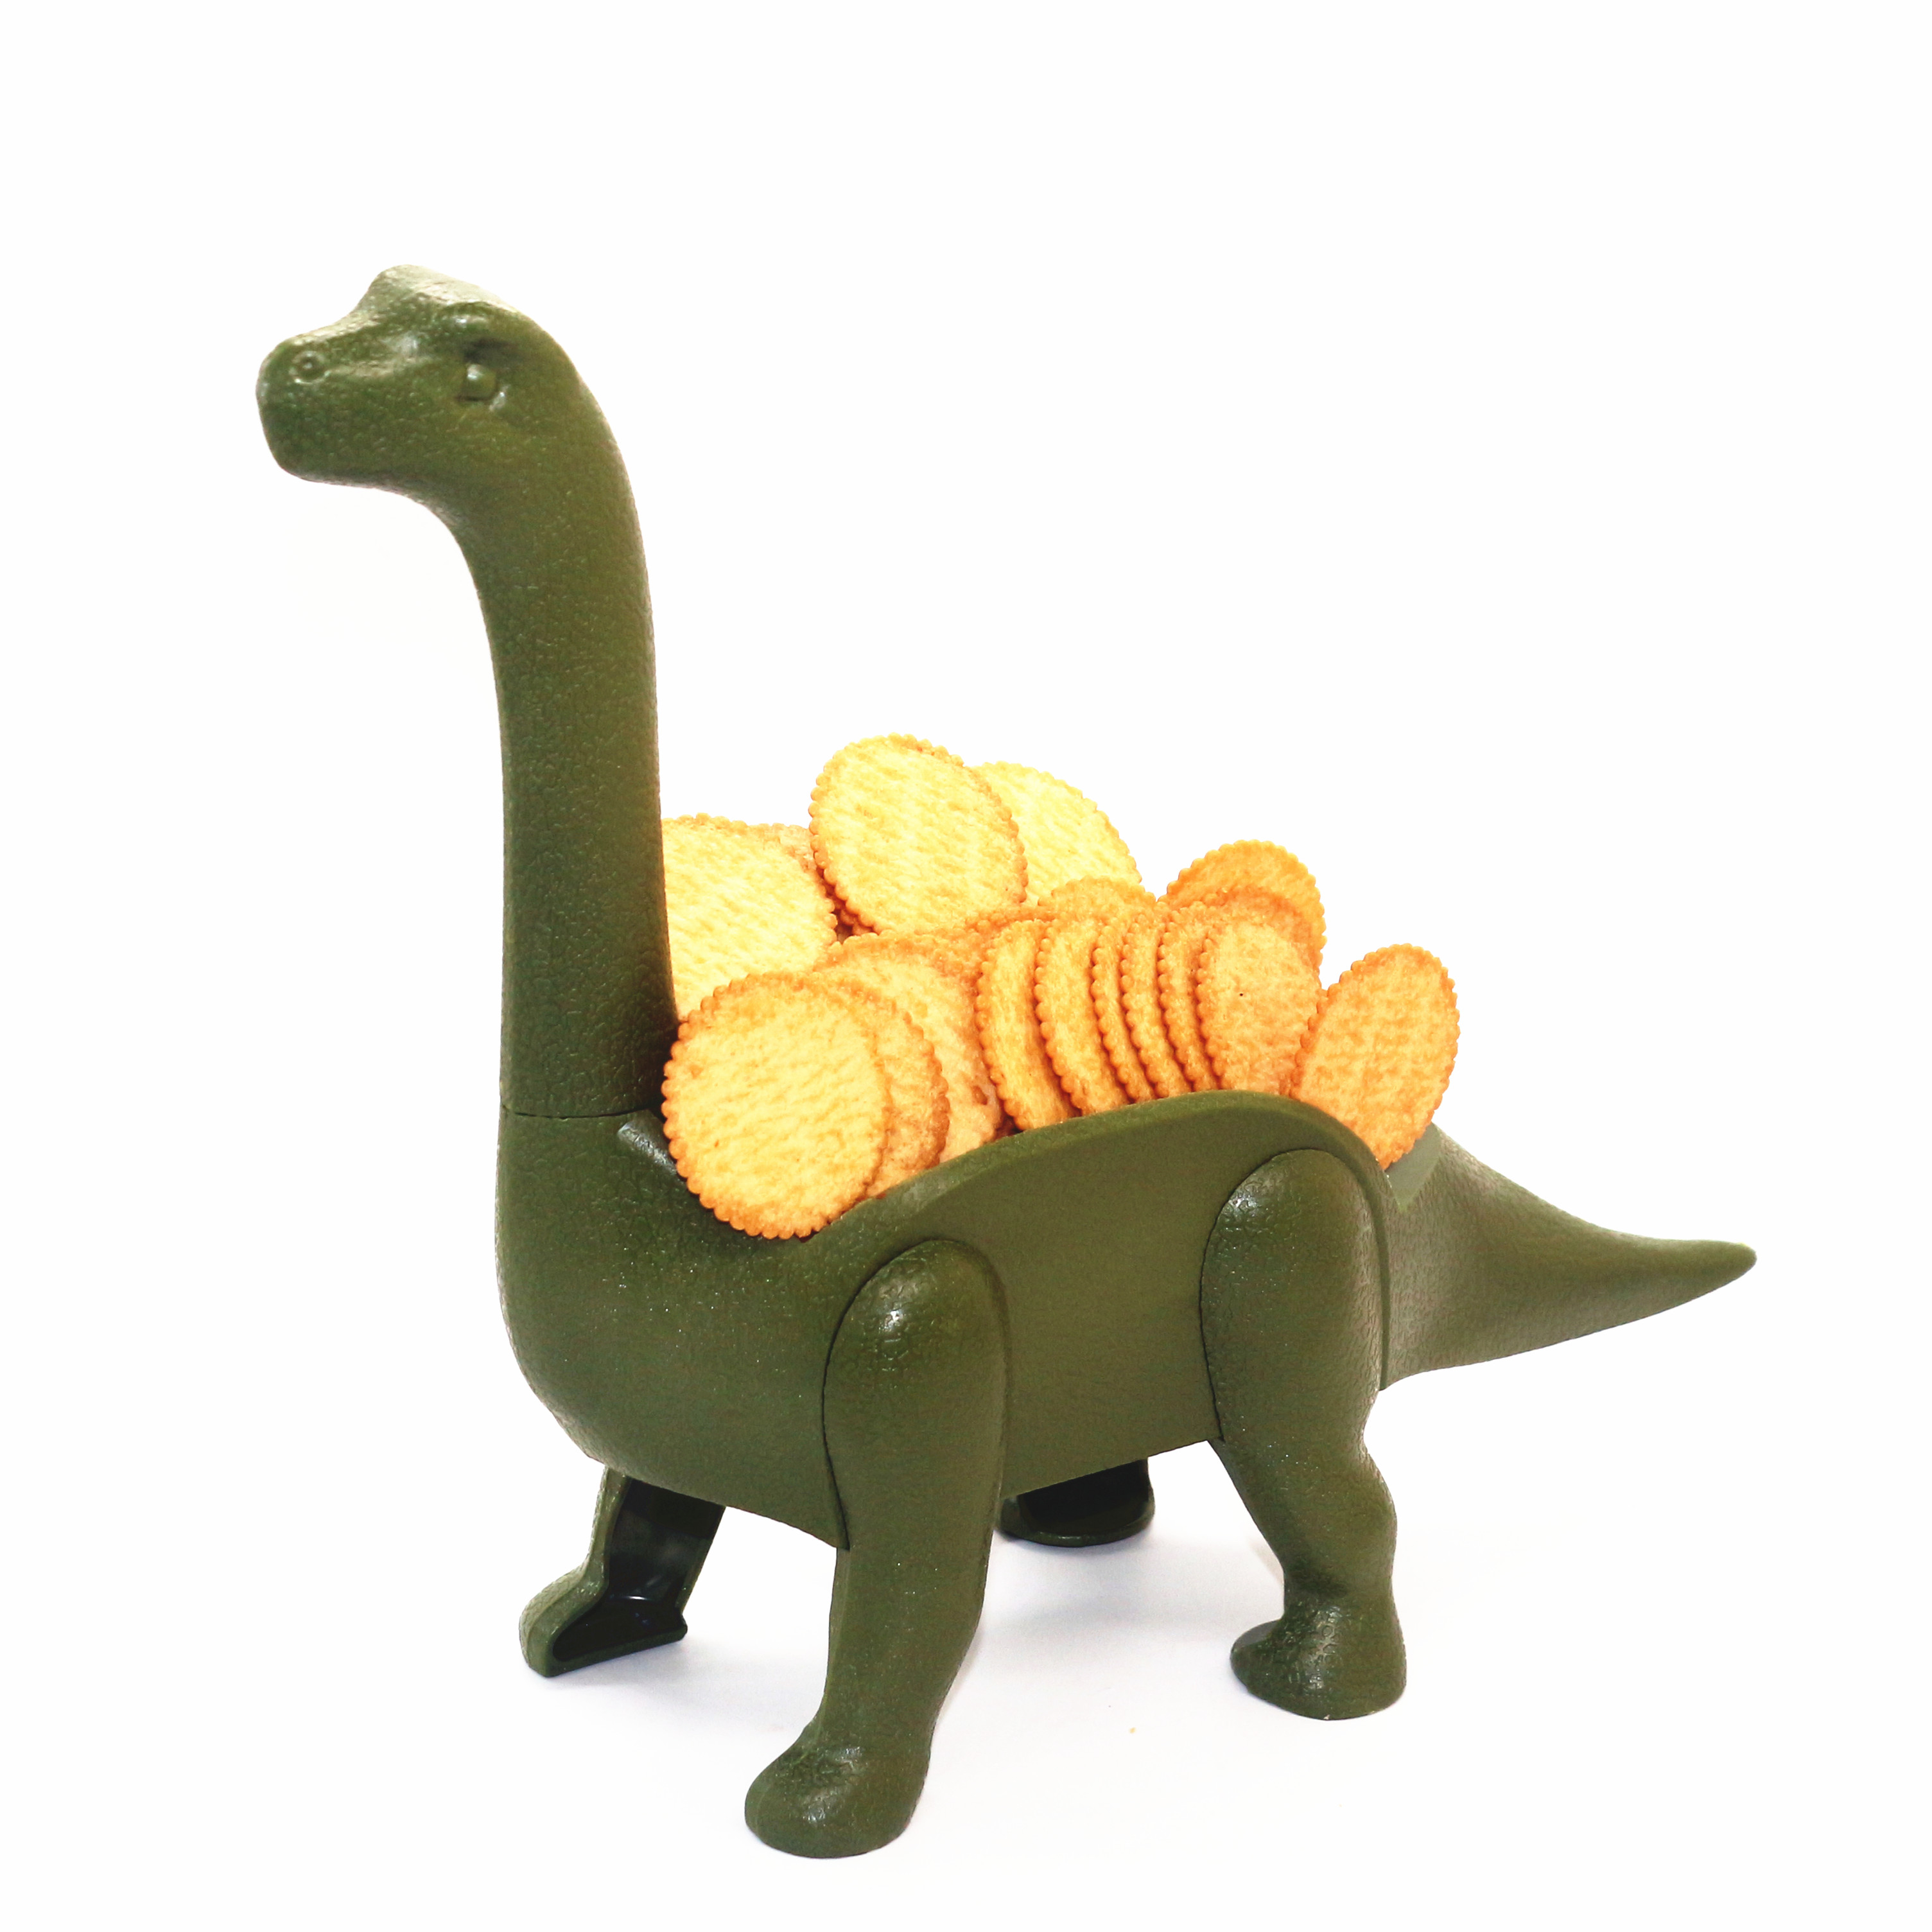 CHRT Ultimate Prehistoric Long Neck Dinosaurs Taco Holder Stand DIY Plastic Kids Taco Holder Wholesale, Green